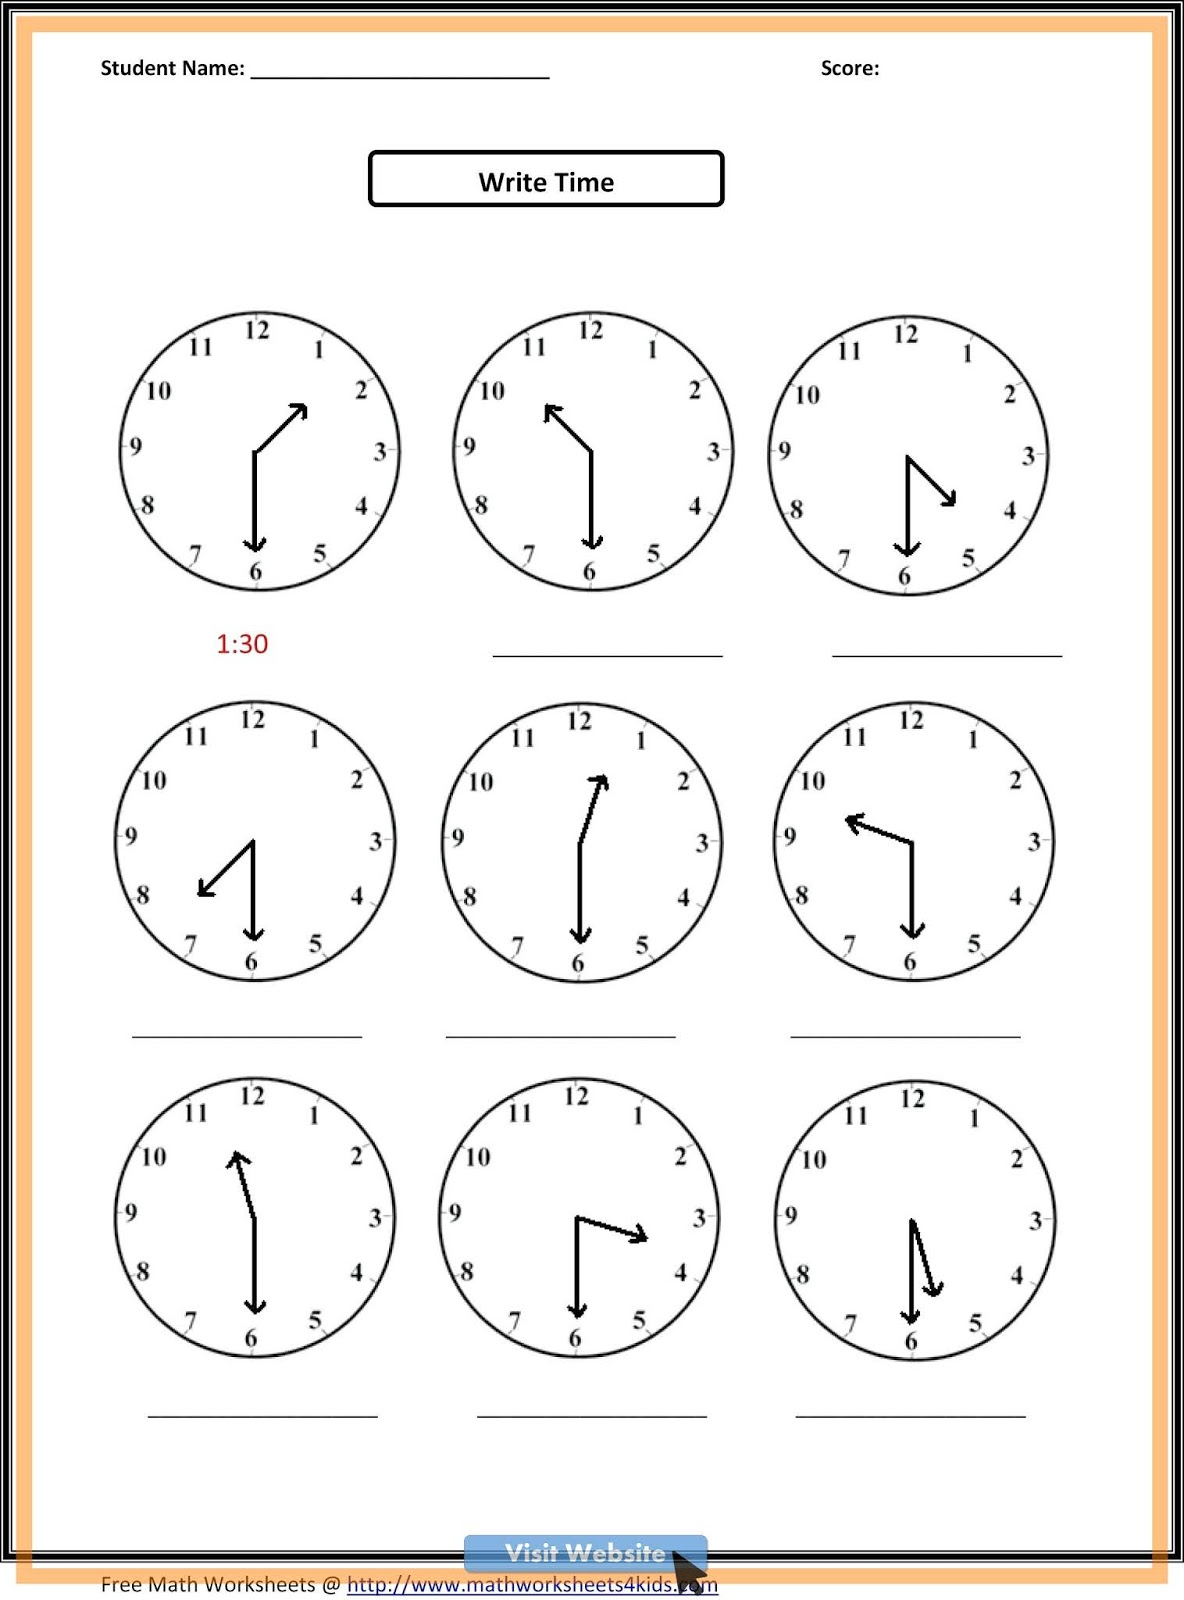 3rd grade math worksheets word problems free printable [ 1600 x 1184 Pixel ]